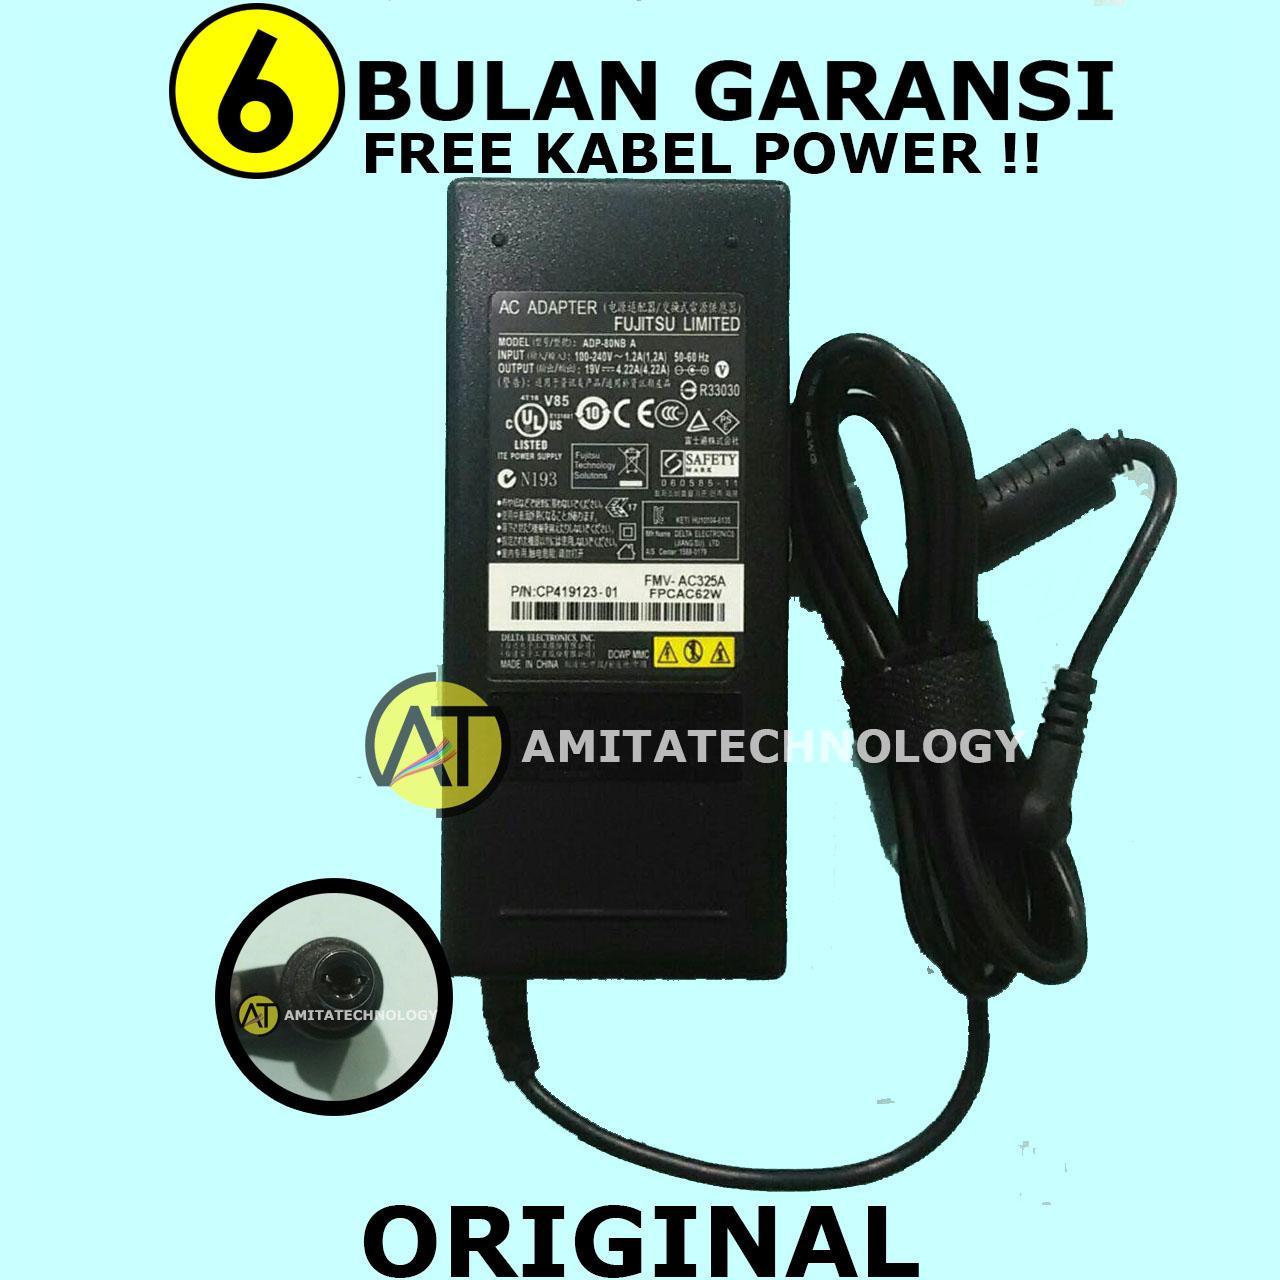 Amita - Adaptor Charger Laptop ORIGINAL Fujitsu 19V 4.22A 80W LH530 LH531 LH532